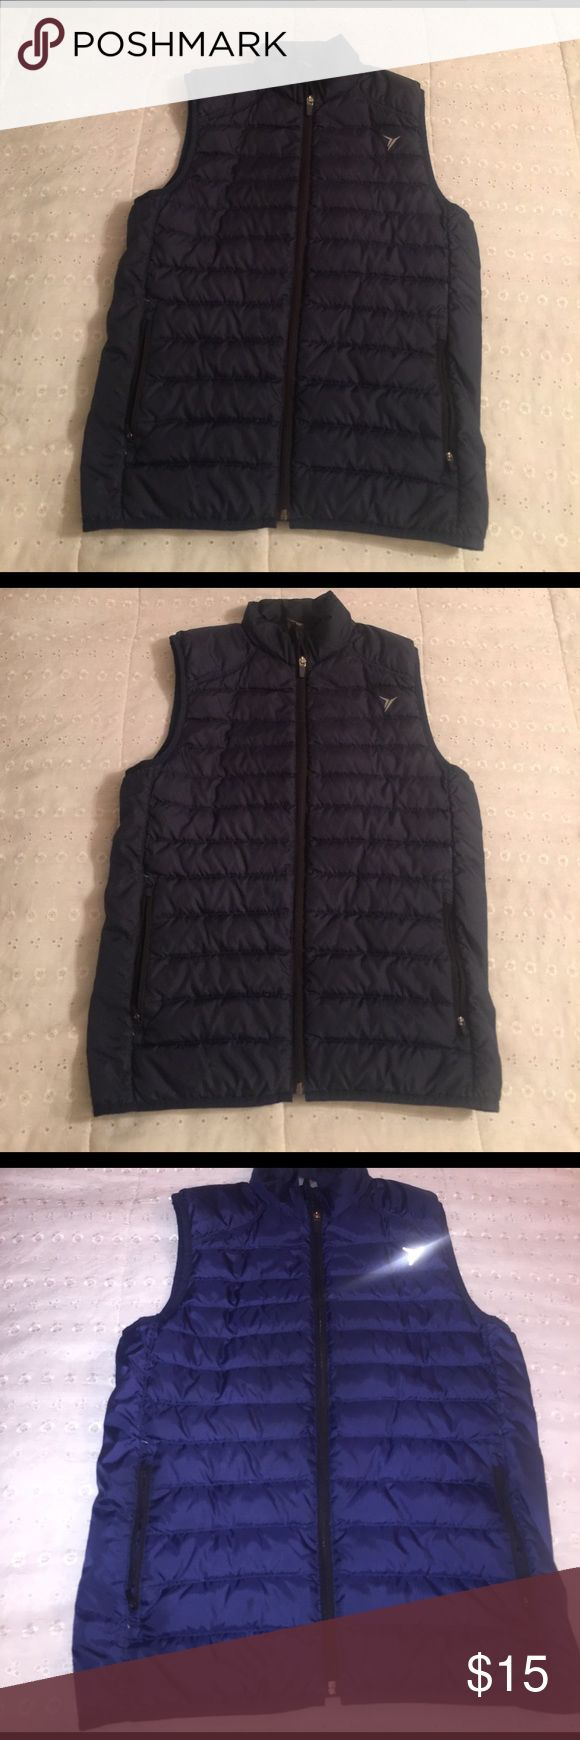 Navy Blue Vest Navy Blue Vest, excellent condition! Old Navy Jackets & Coats Vests